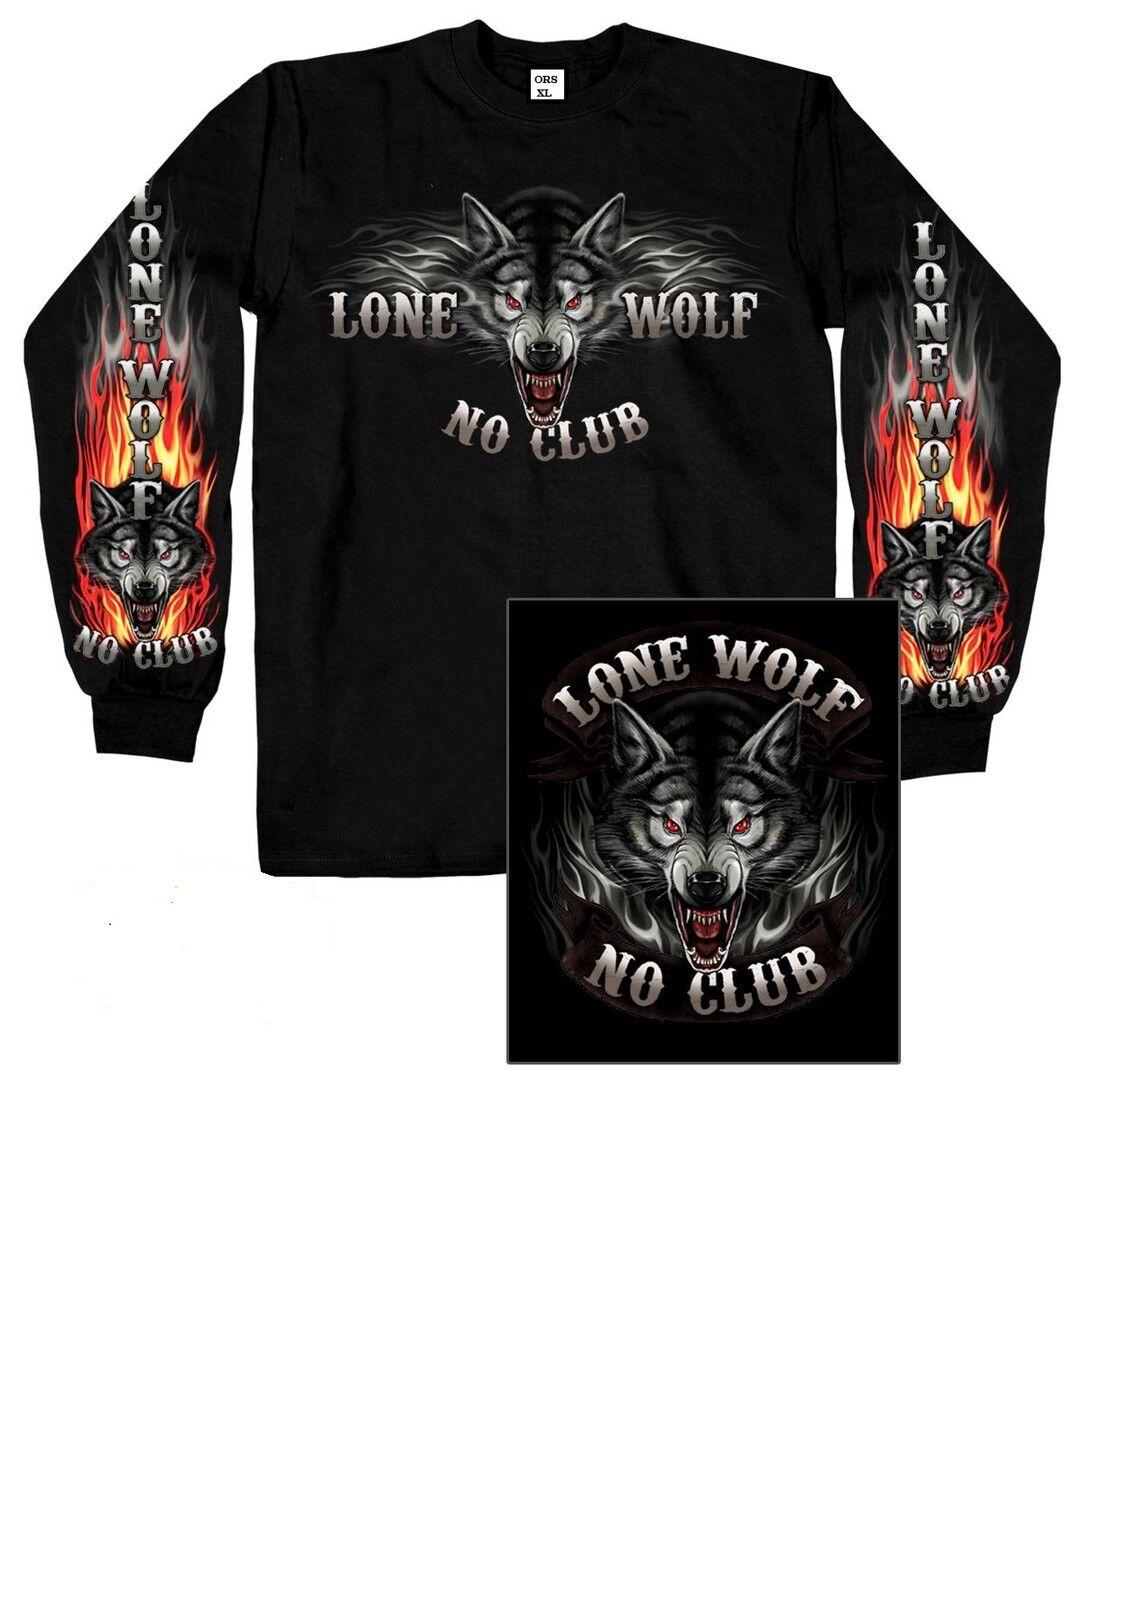 Longsleeve/Langarm T Shirt mit einem Chopper-,Bikermotiv Modell Lone Wolf